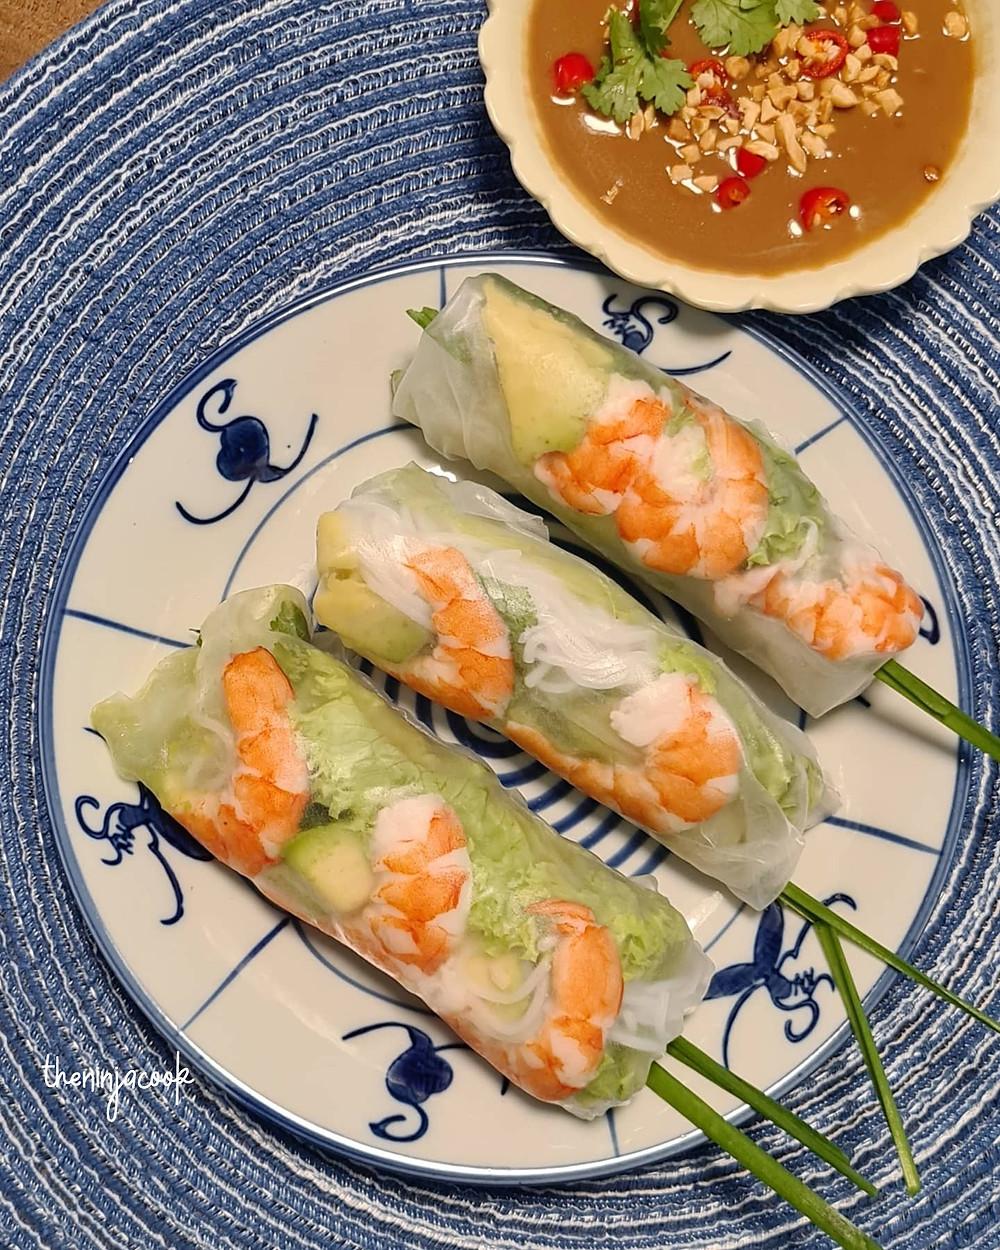 goi cuon, vietnamese spring rolls, vietnamese food